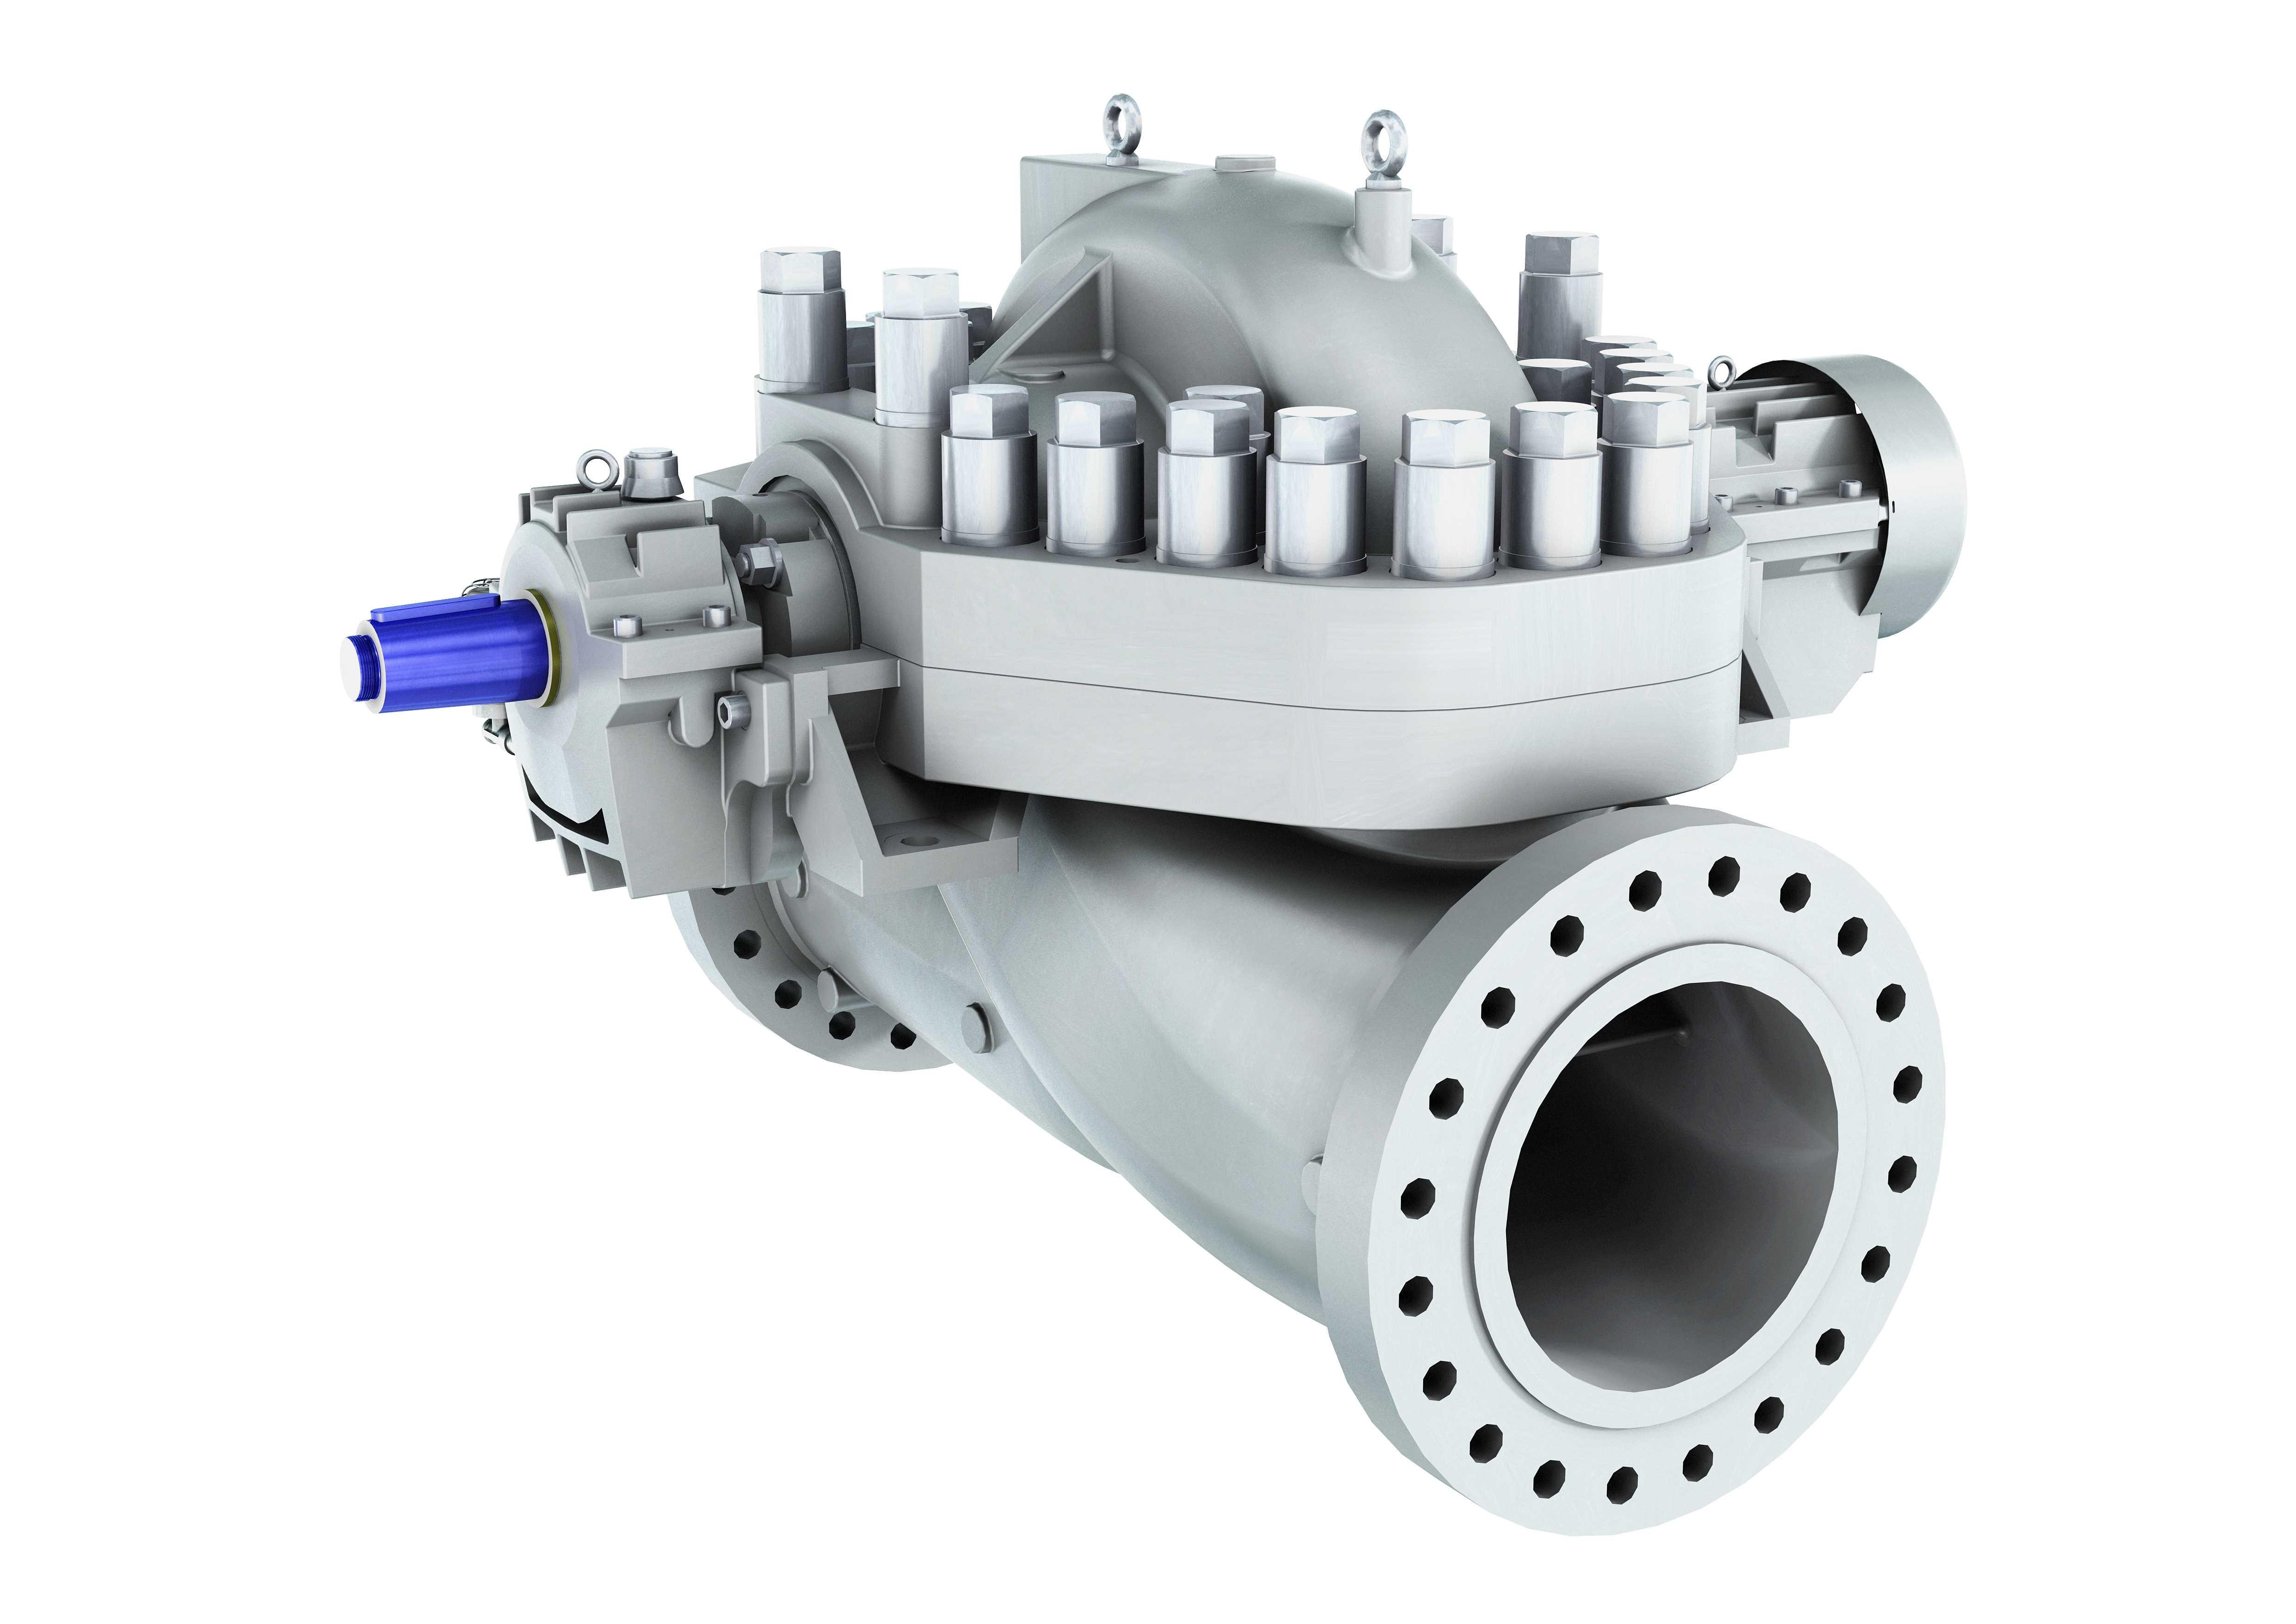 hsb axially split single stage between bearing pump sulzer rh sulzer com Pumps Sulzer Water Binghamheavy Bingham Pump Company